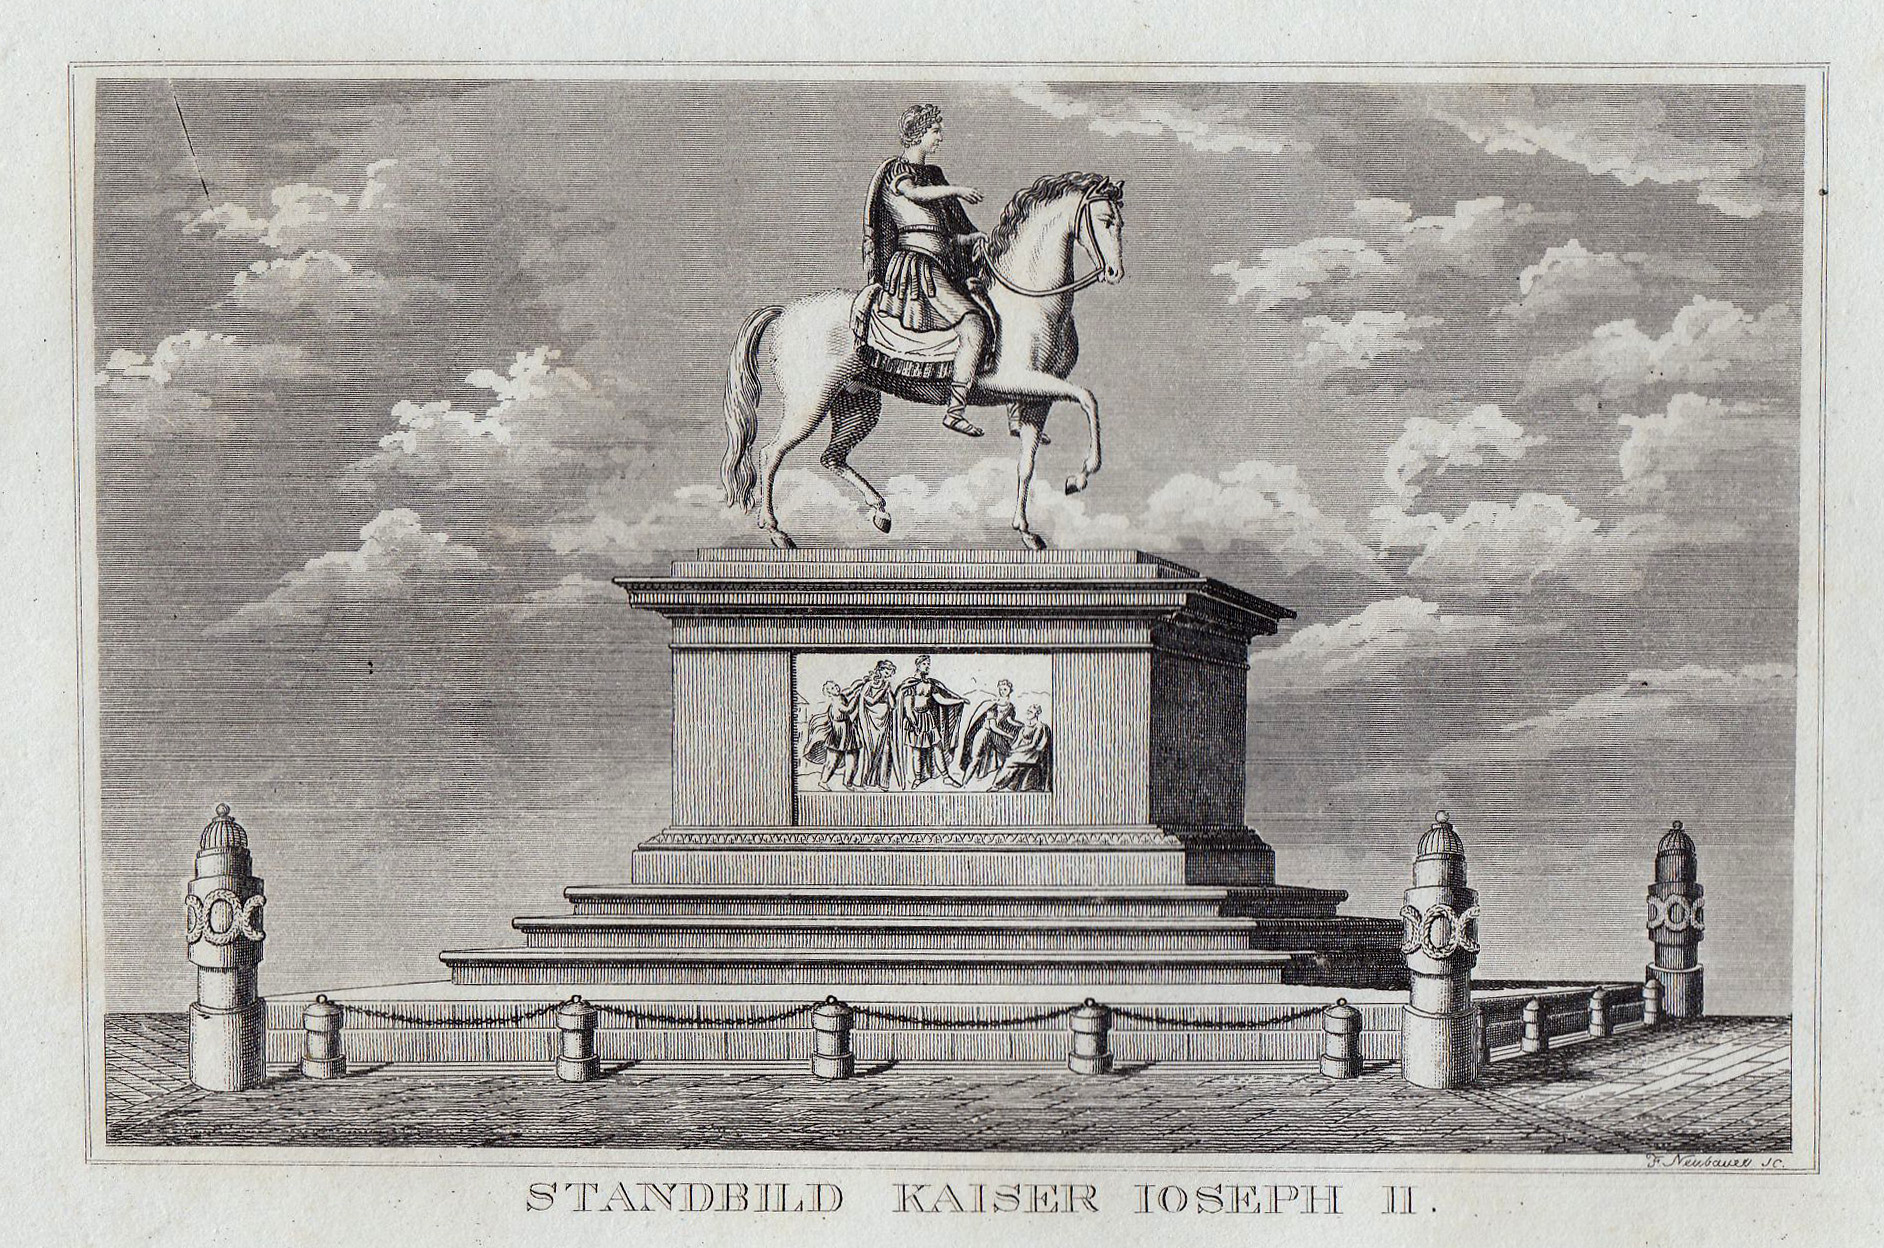 TA., Denkmal Josef II.: Wien ( Vienna